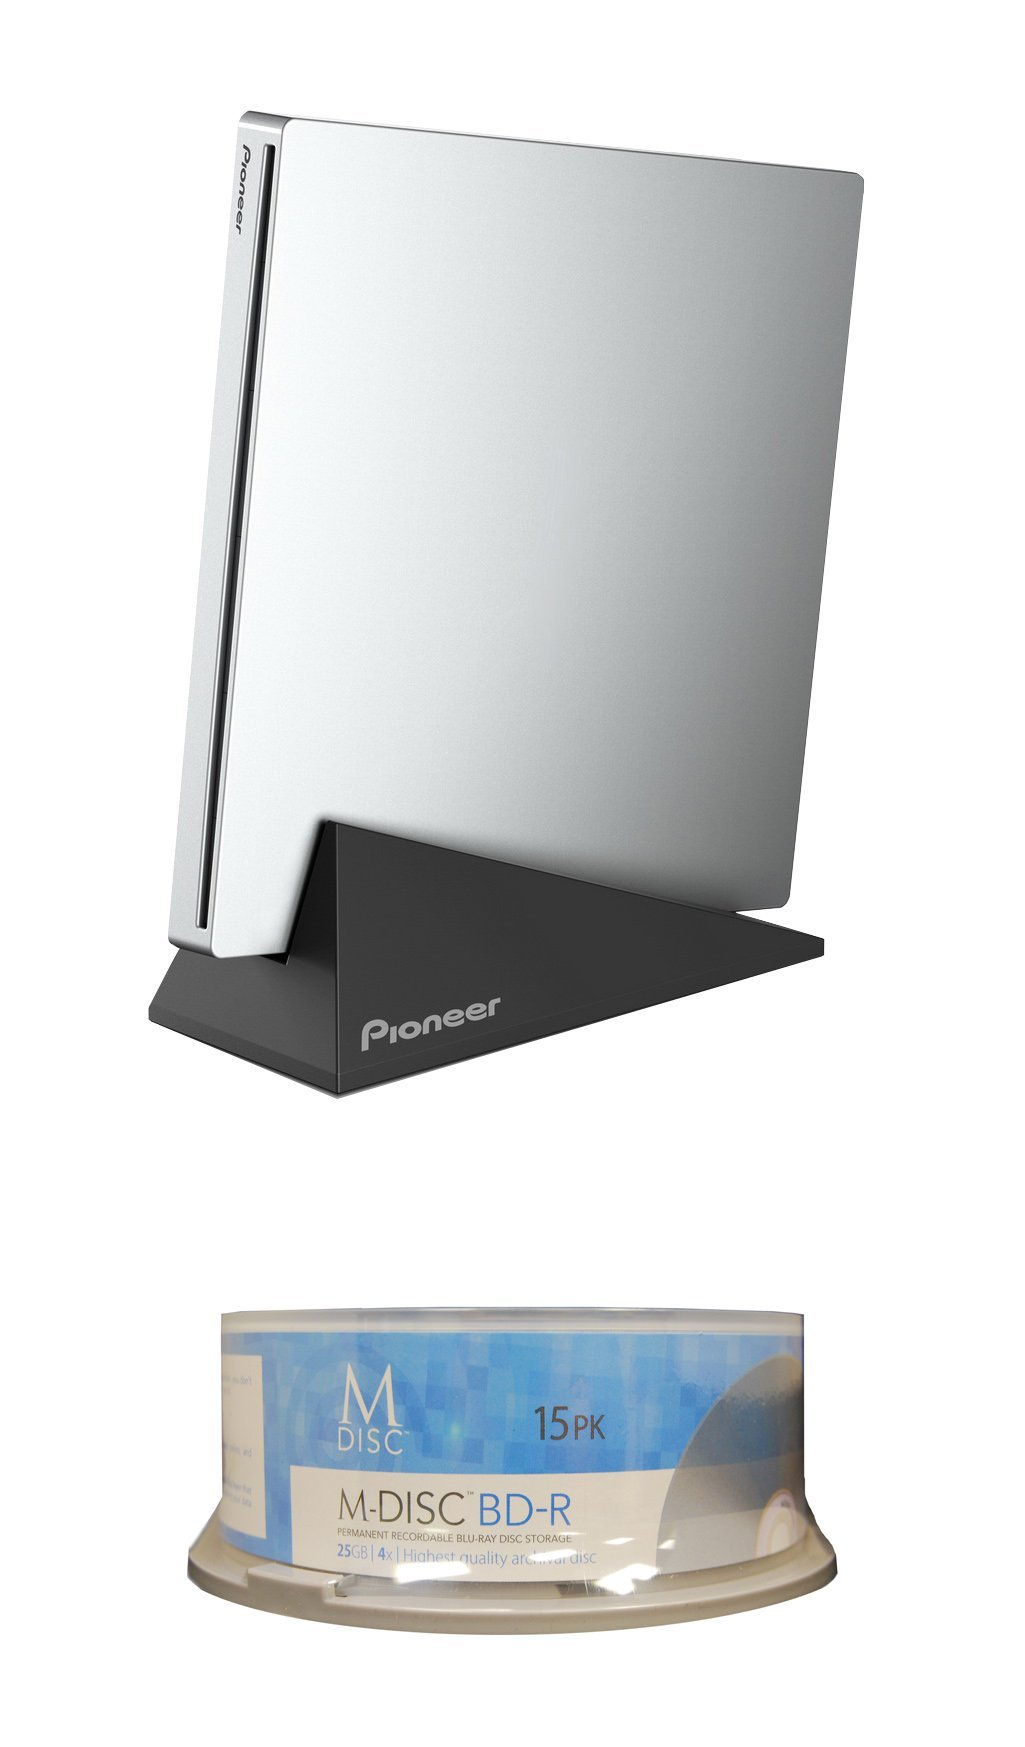 Pioneer 6X BDR-XU03 Slim Portable Blu-ray Burner Bundle with 15 Pack M-DISC BD - Supports USB 3.0, BDXL, BD, DVD, and CD Media (Silver, Retail Box)